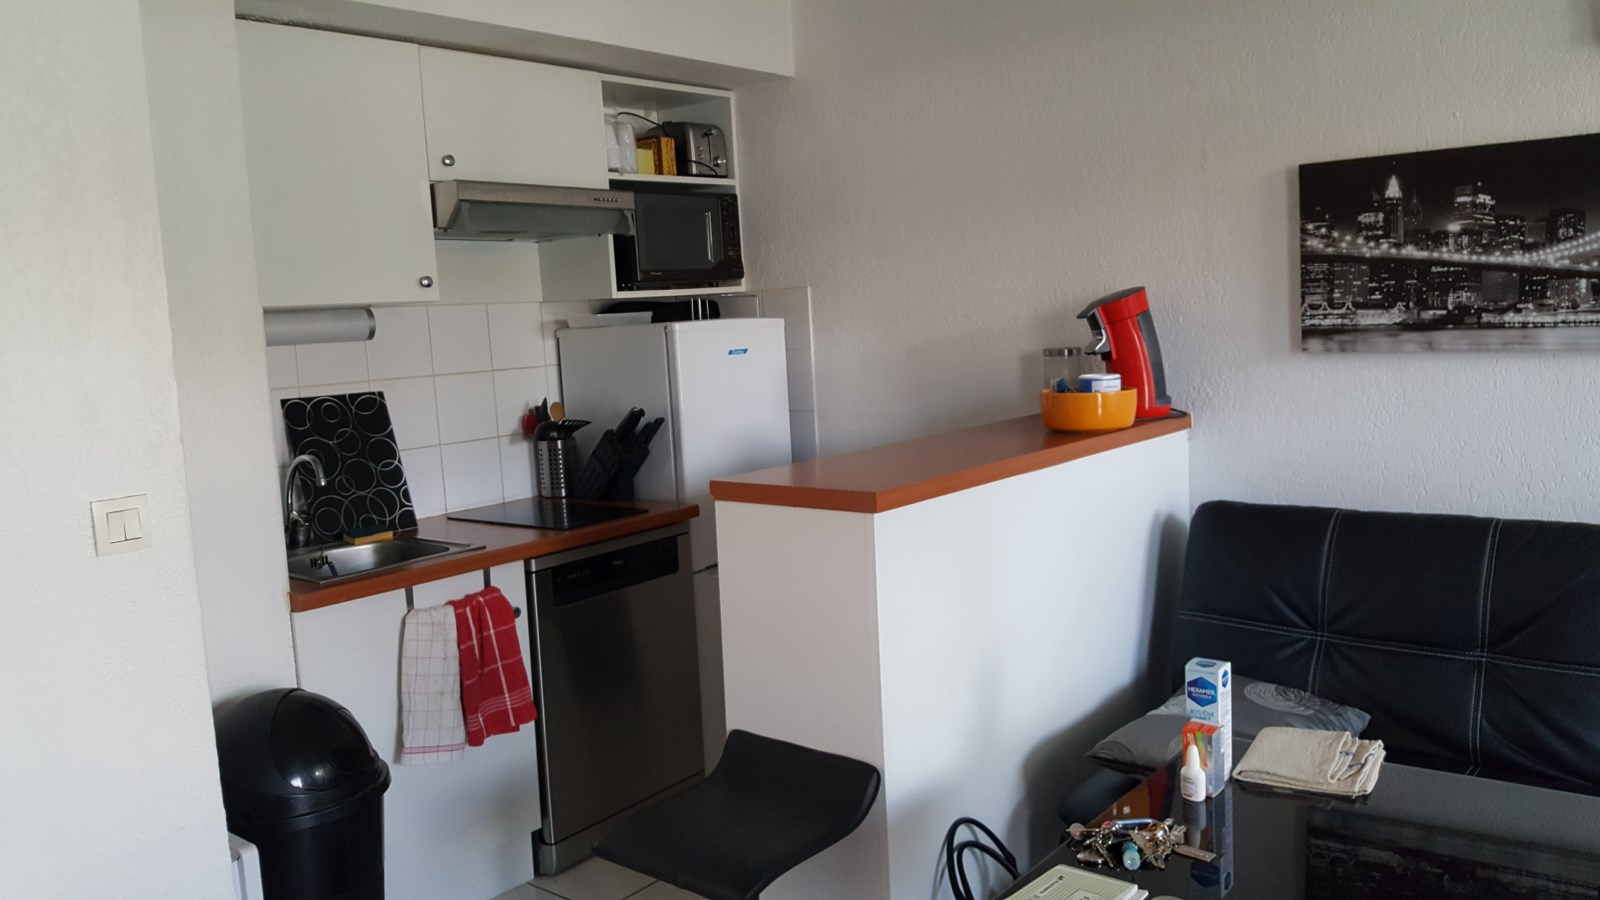 Location A Louer Appartement T2 Meuble A Toulouse